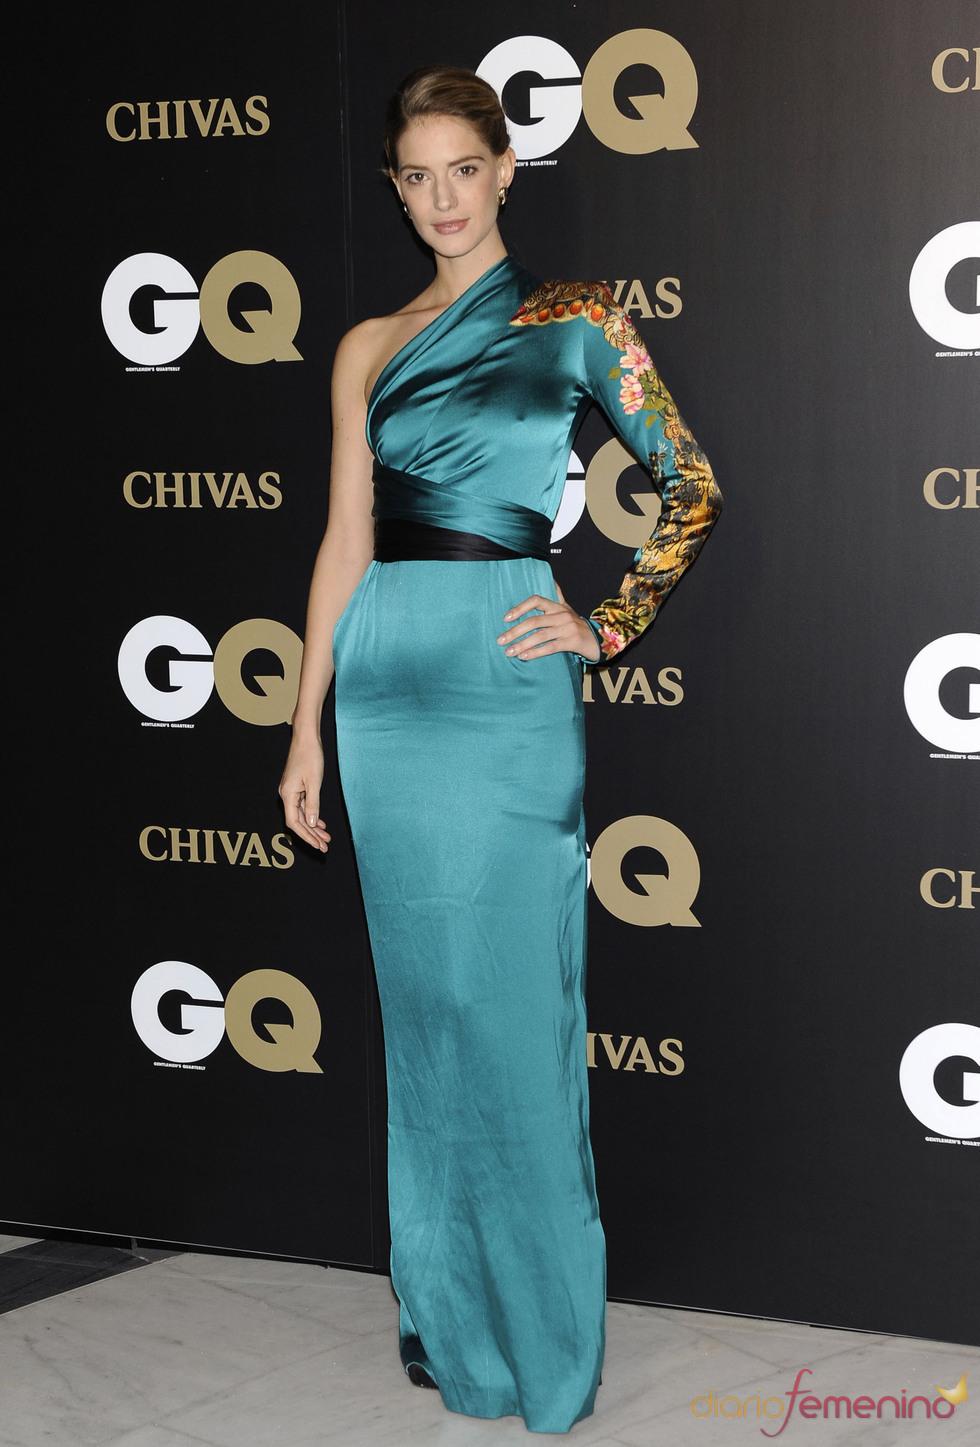 Teresa Baca Astolfi en los premios españoles Gq 2010